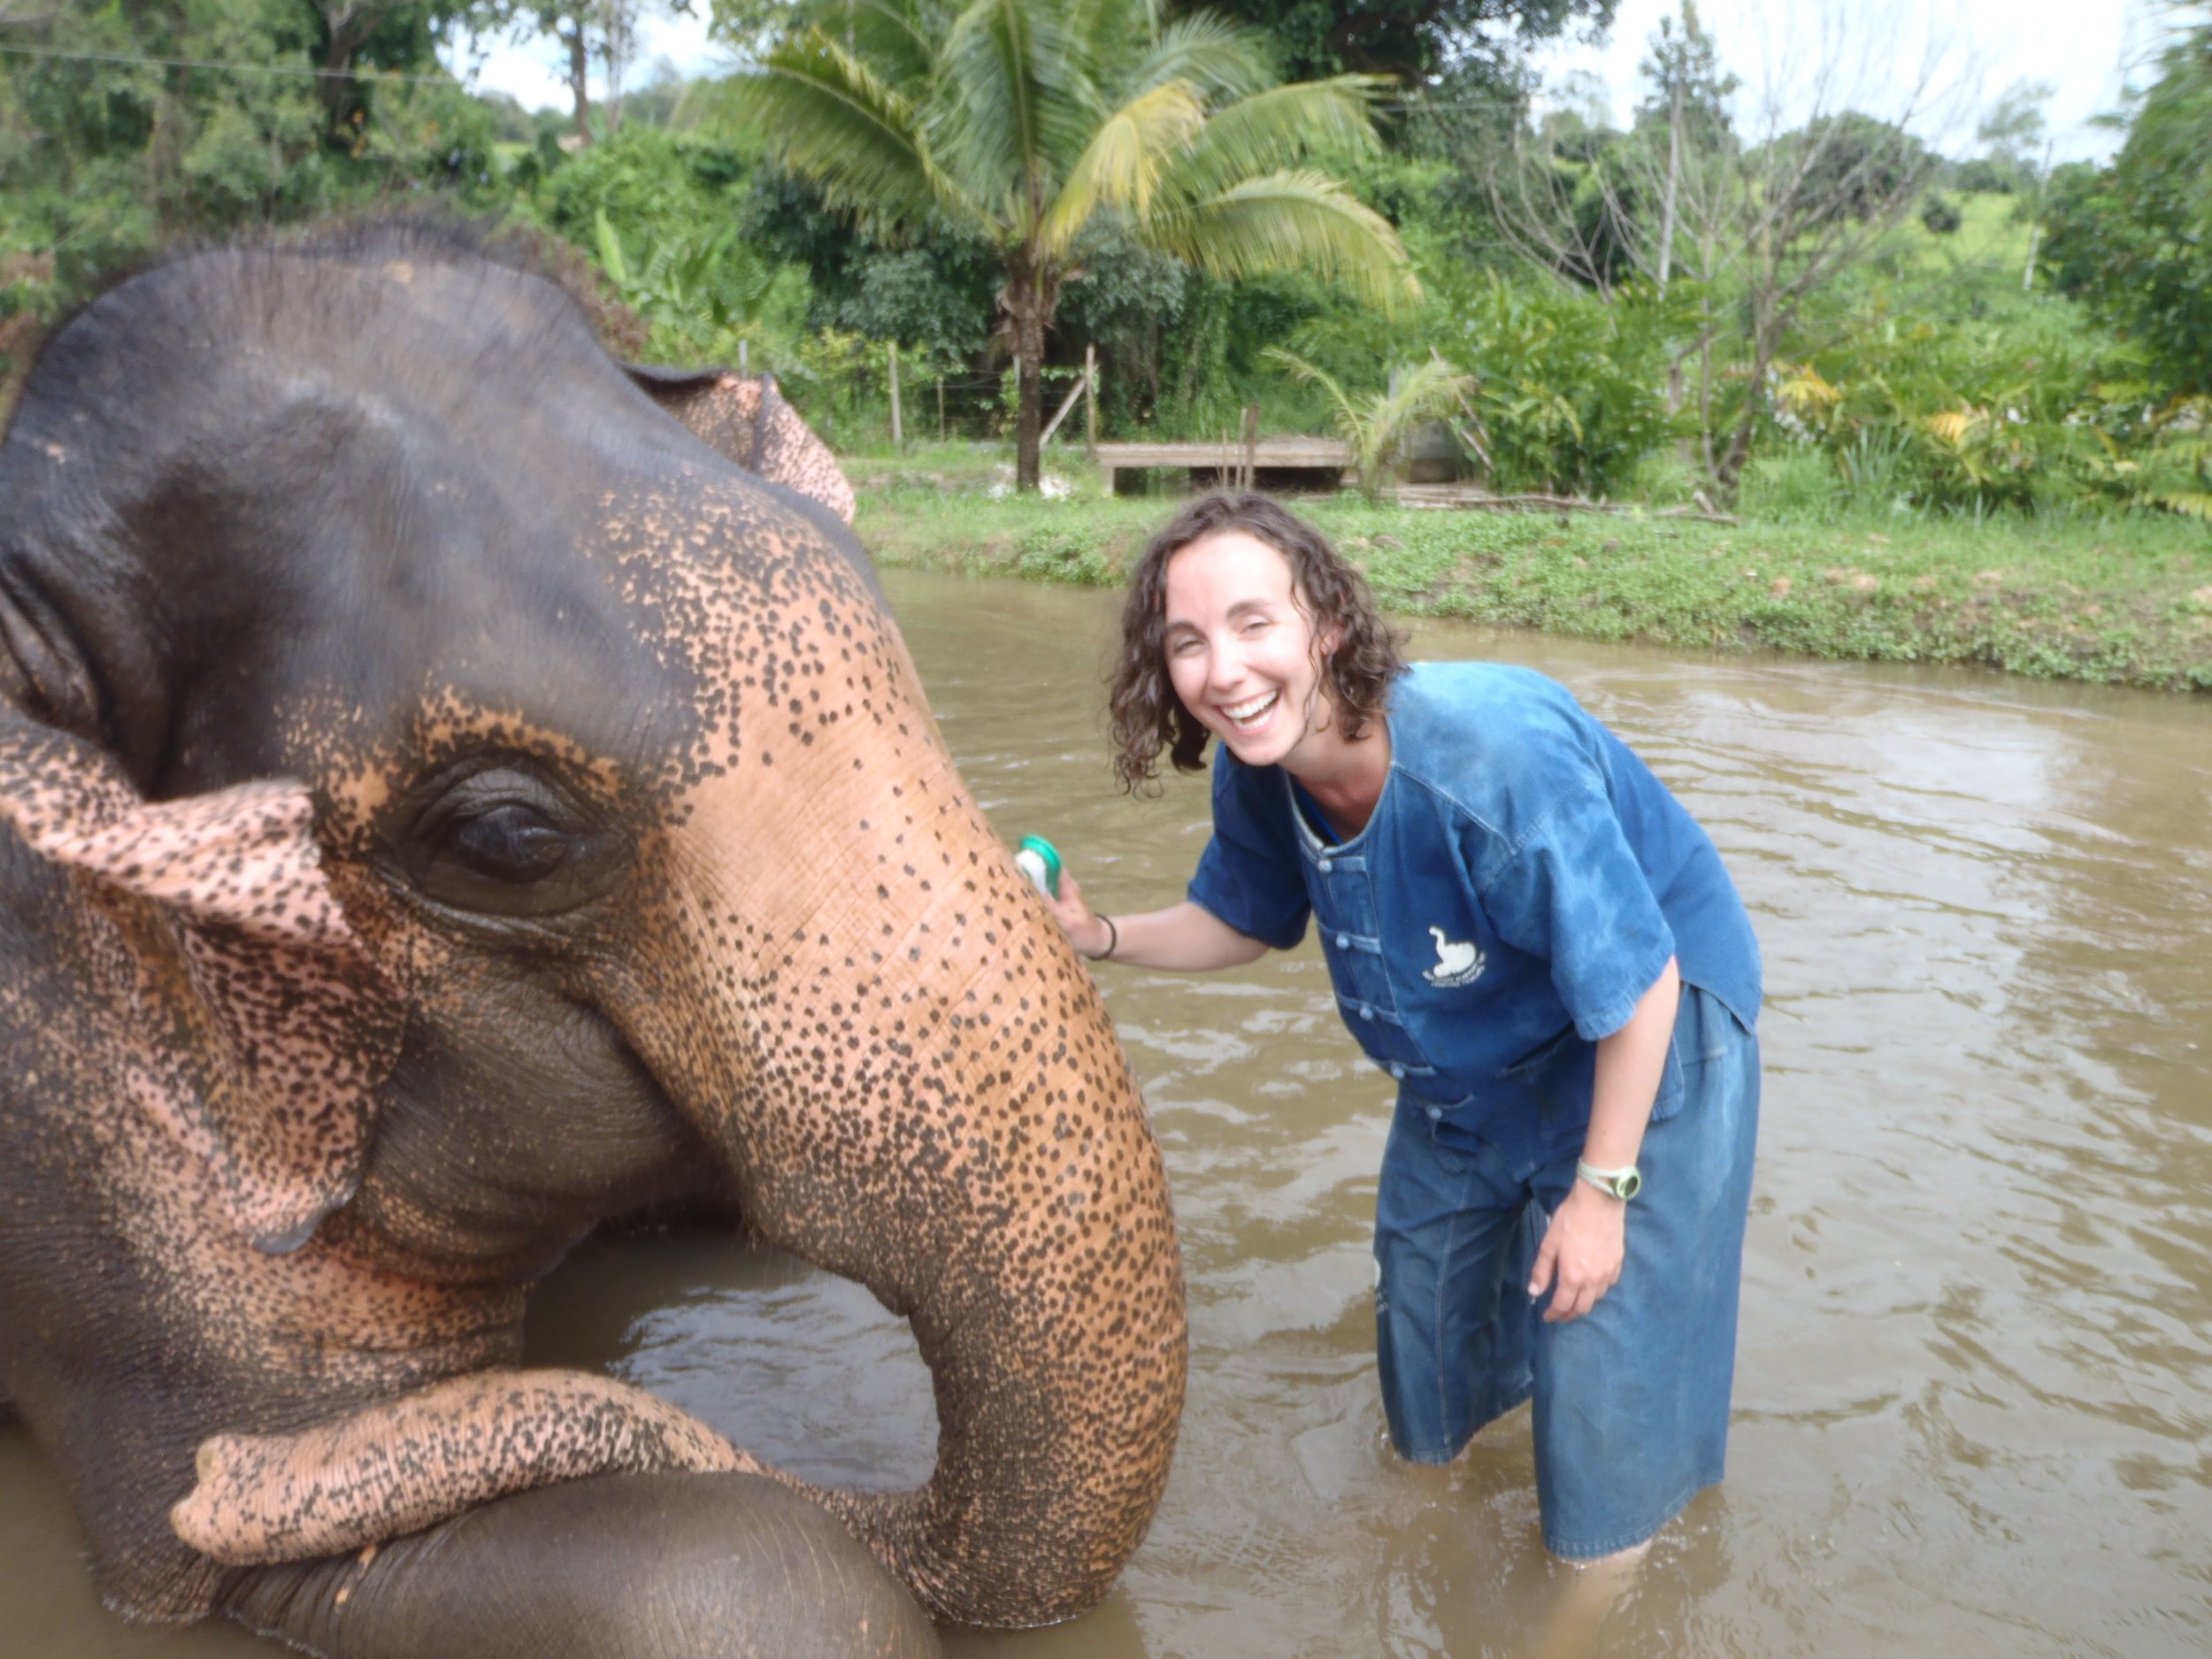 Elephant smiles at Baan Chang Elephant Park Chiang Mai Thailand